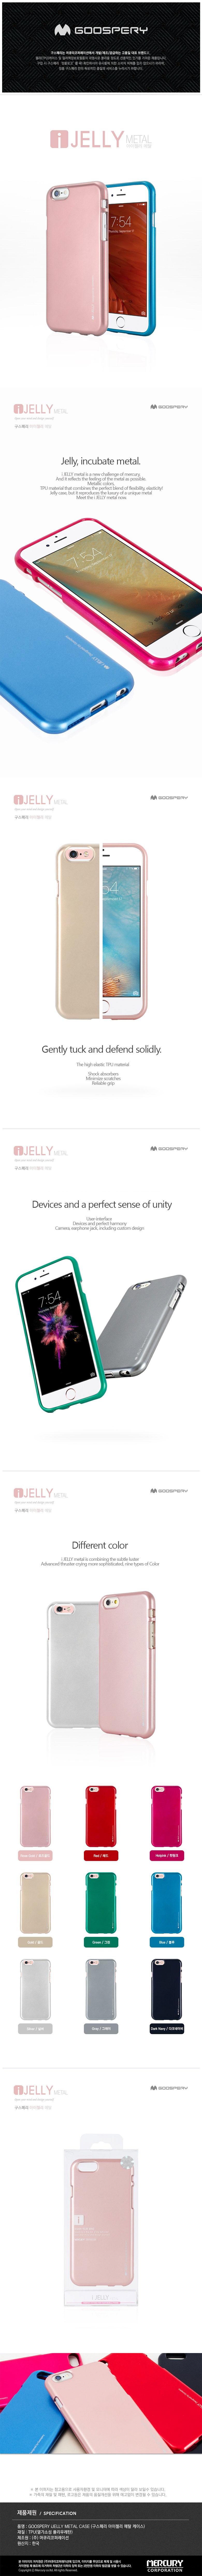 Every Need Want Day Goospery Samsung Galaxy S7 Edge Soft Feeling Jelly Case Black 02 Iron 03 Mercury